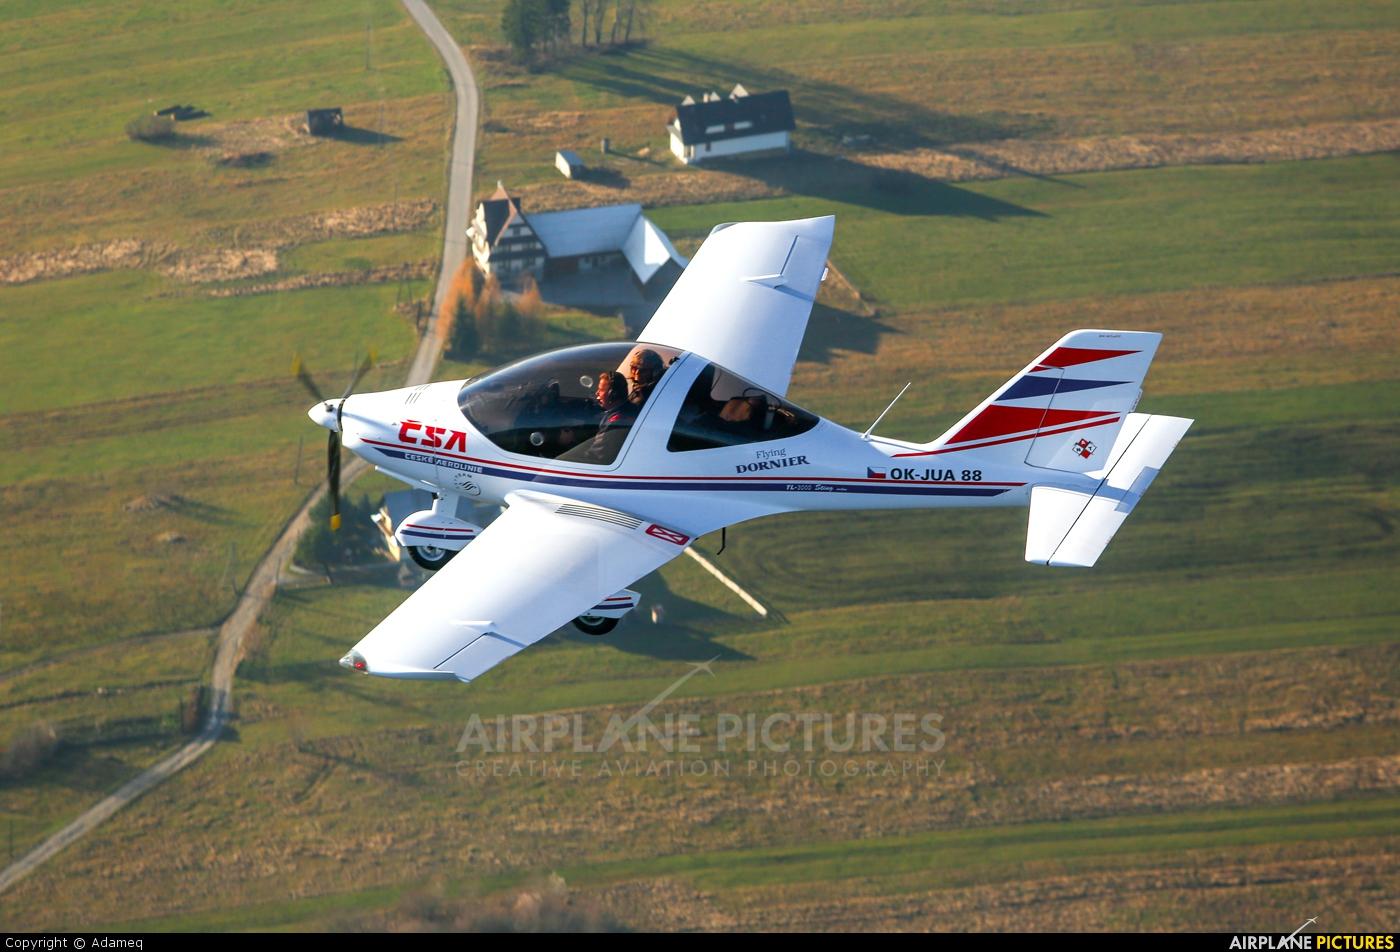 Private OK-JUA 88 aircraft at In Flight - Poland